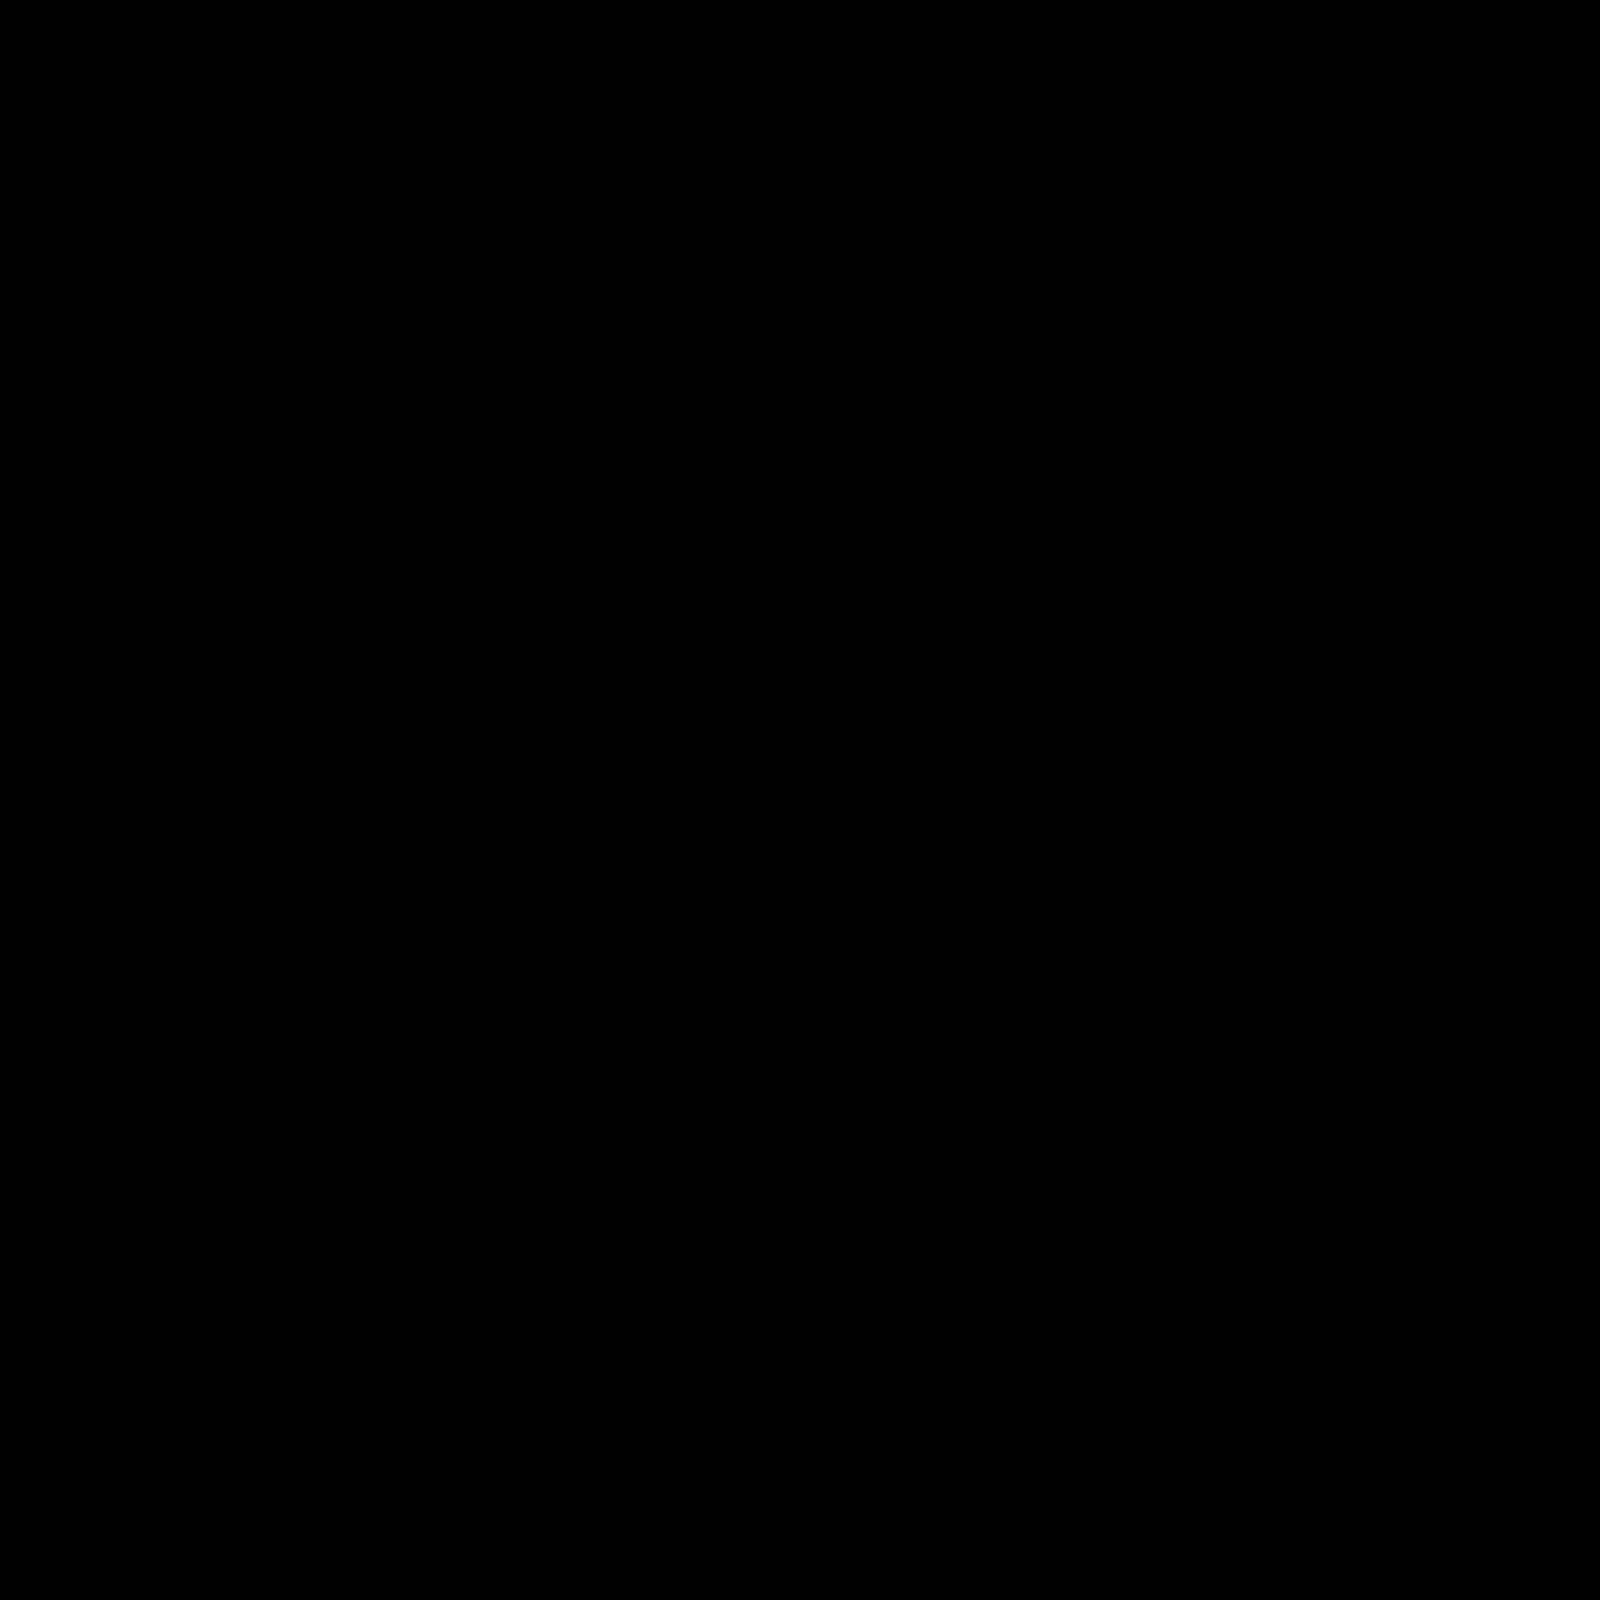 Spirala DNA icon